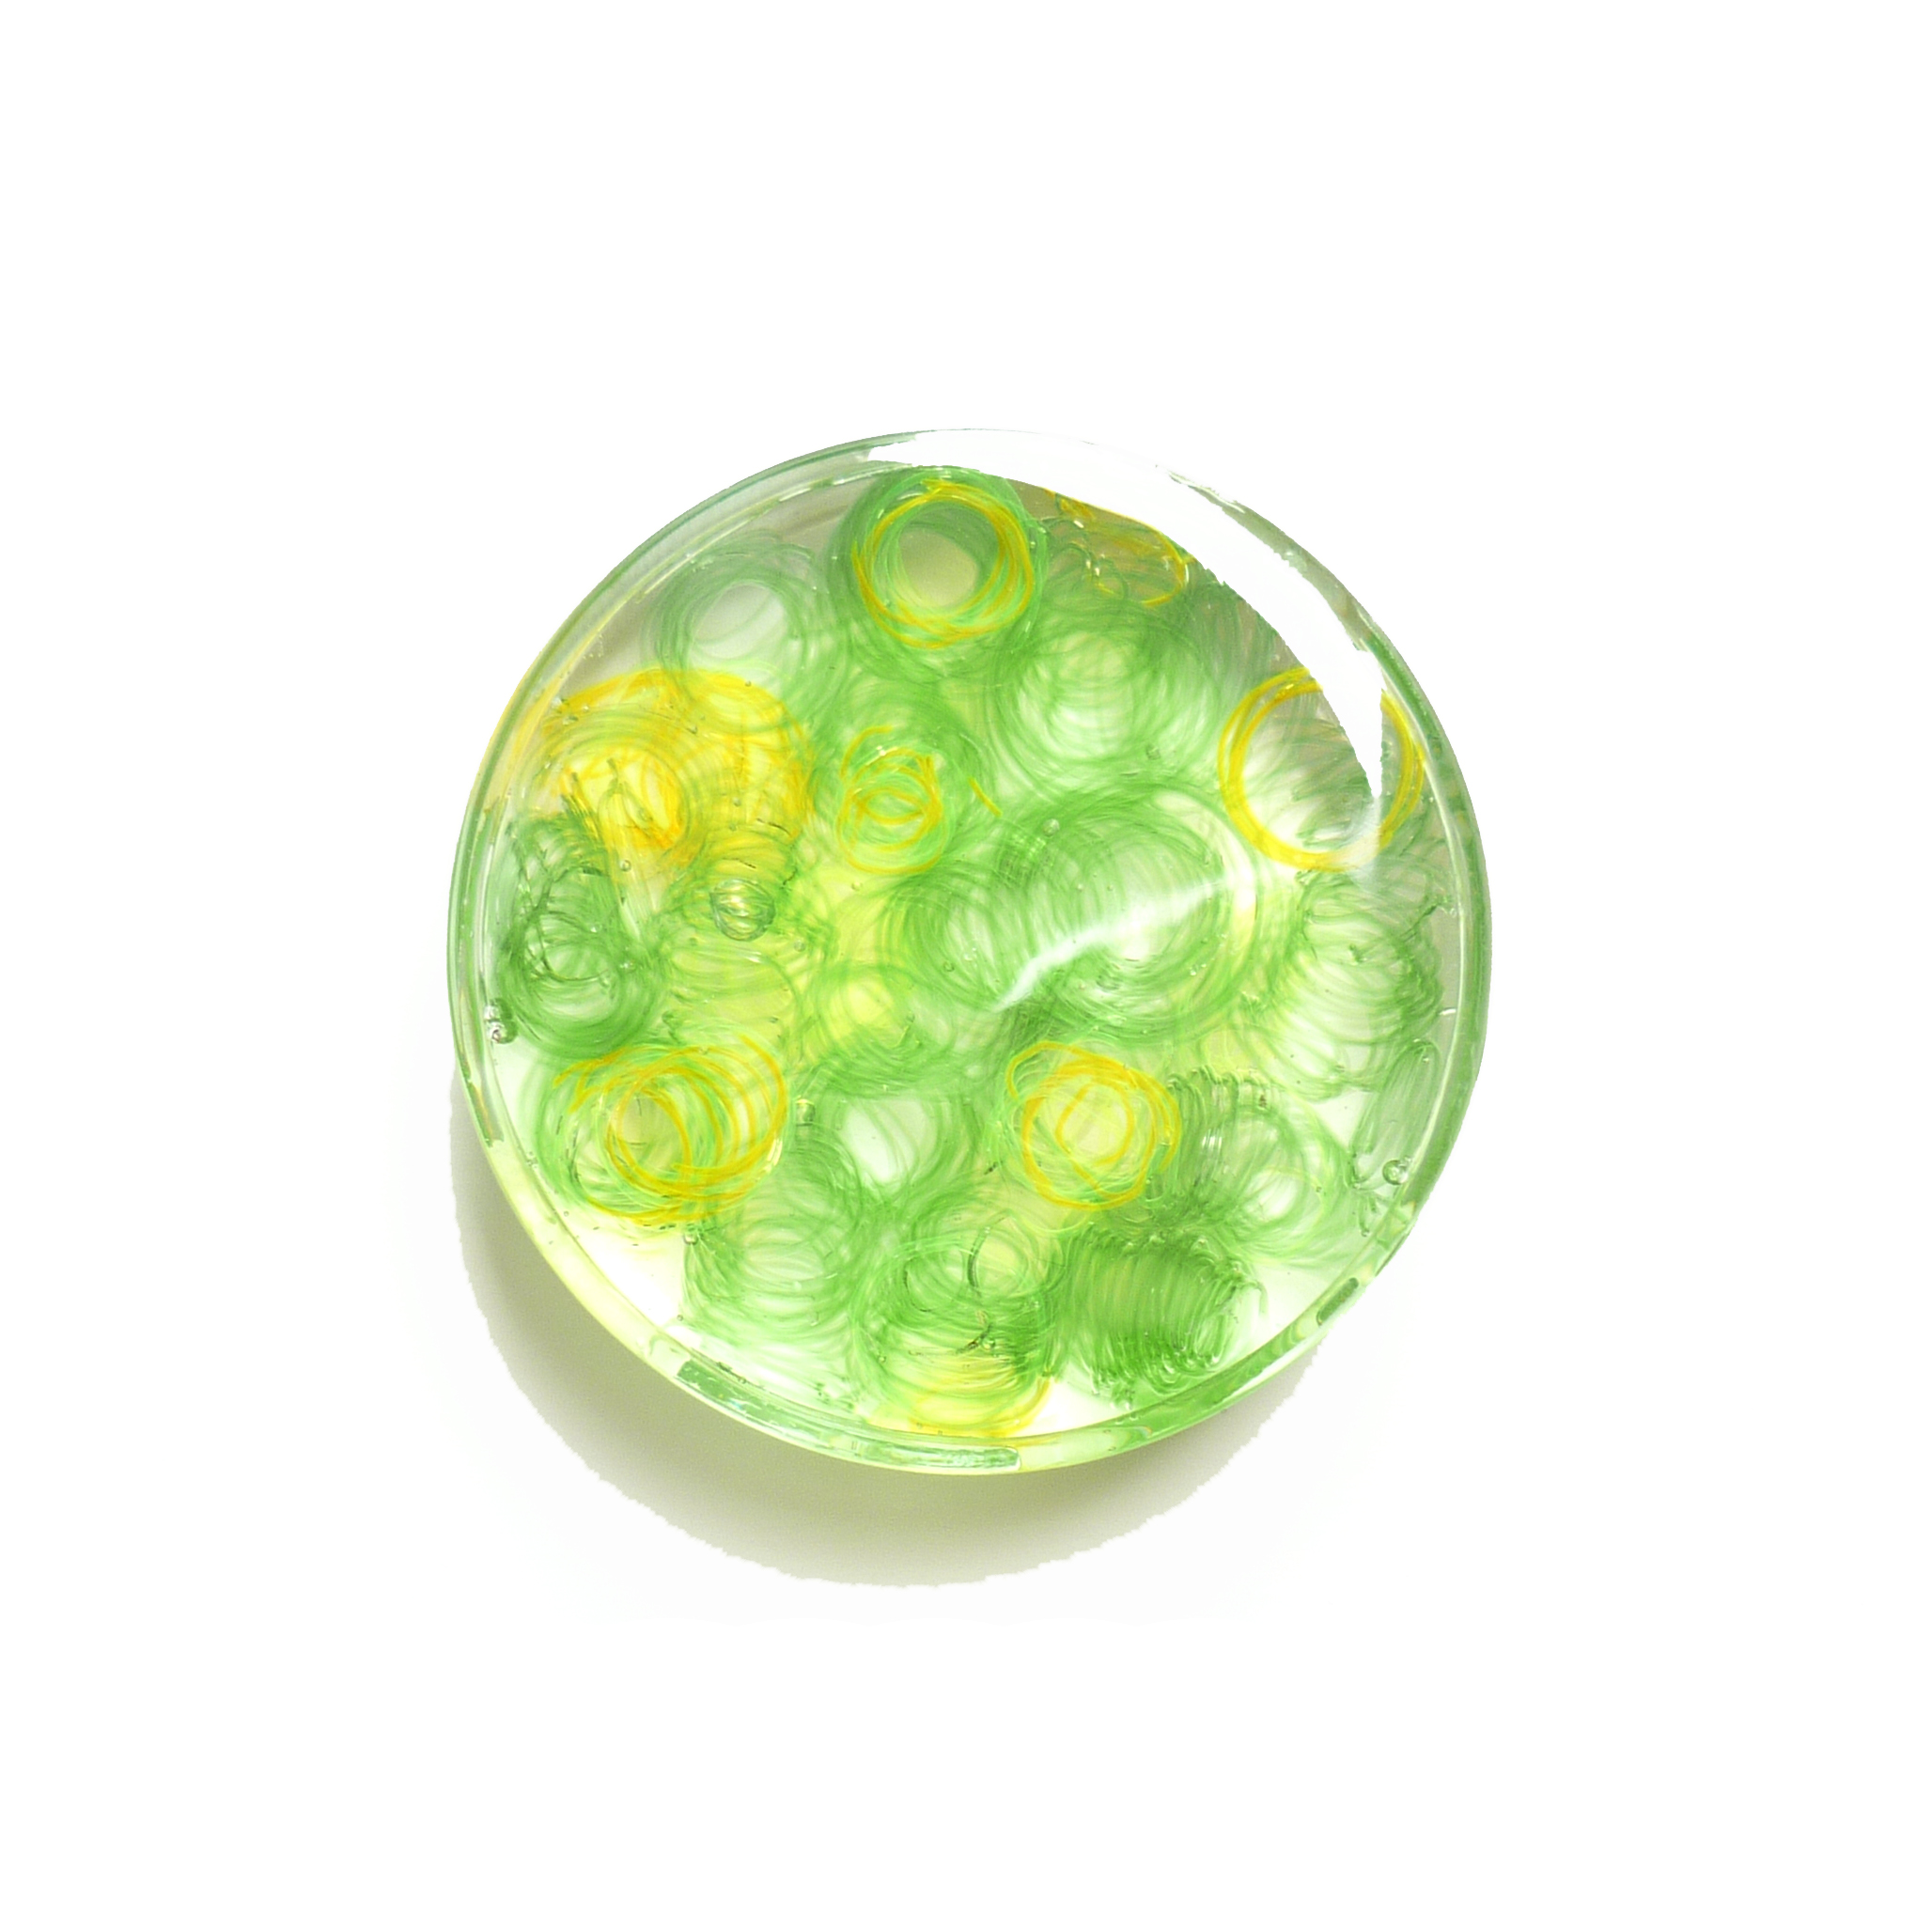 田村陽子 緑色の実験